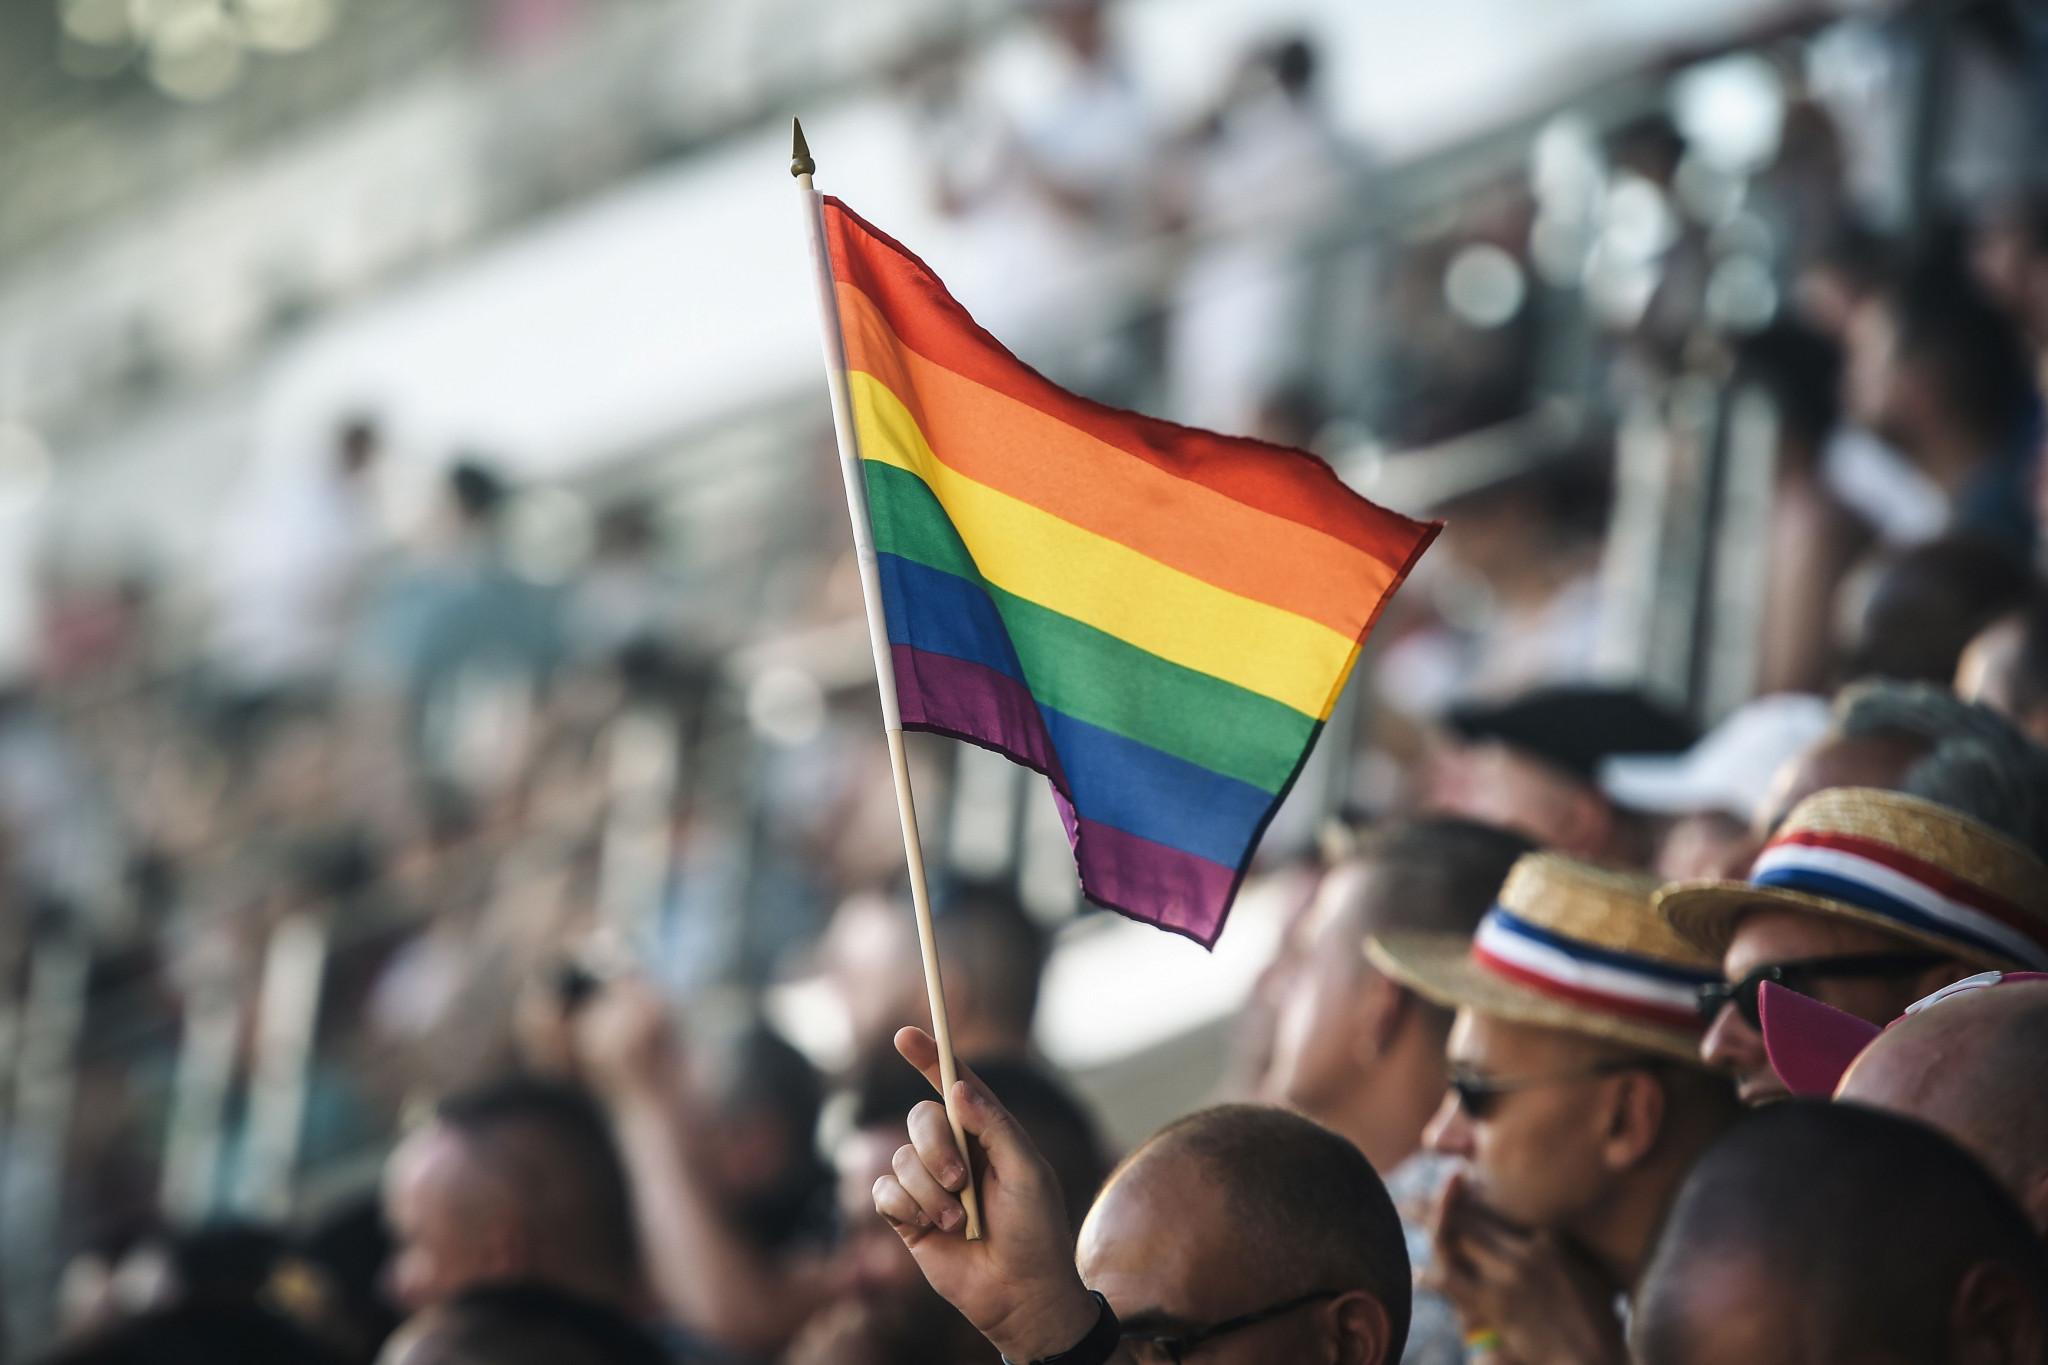 Gay Games postponed to 2023 due to Hong Kong COVID-19 restrictions